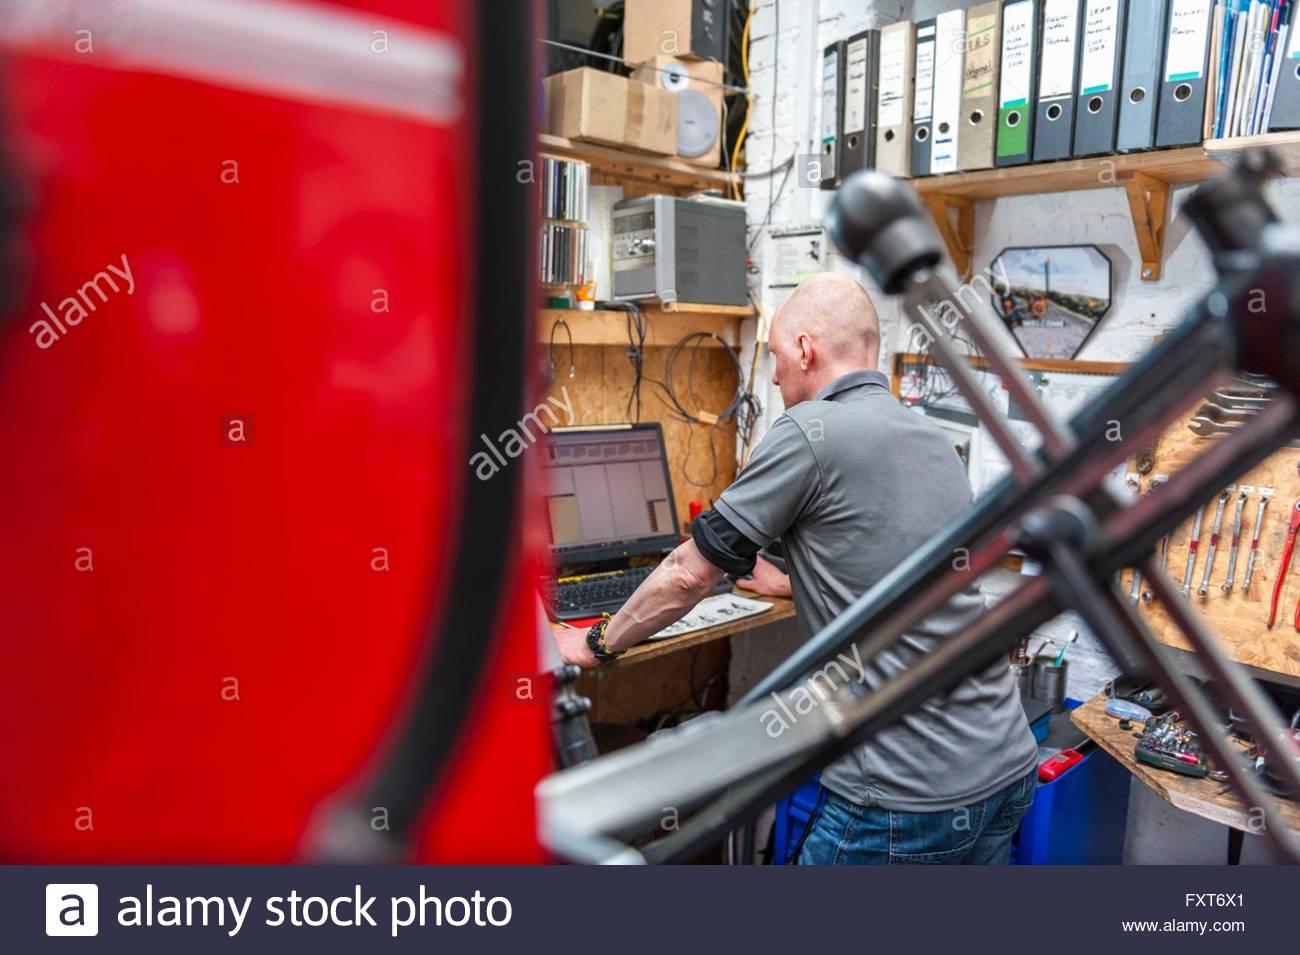 Mechanic using computer in workshop - Stock Image